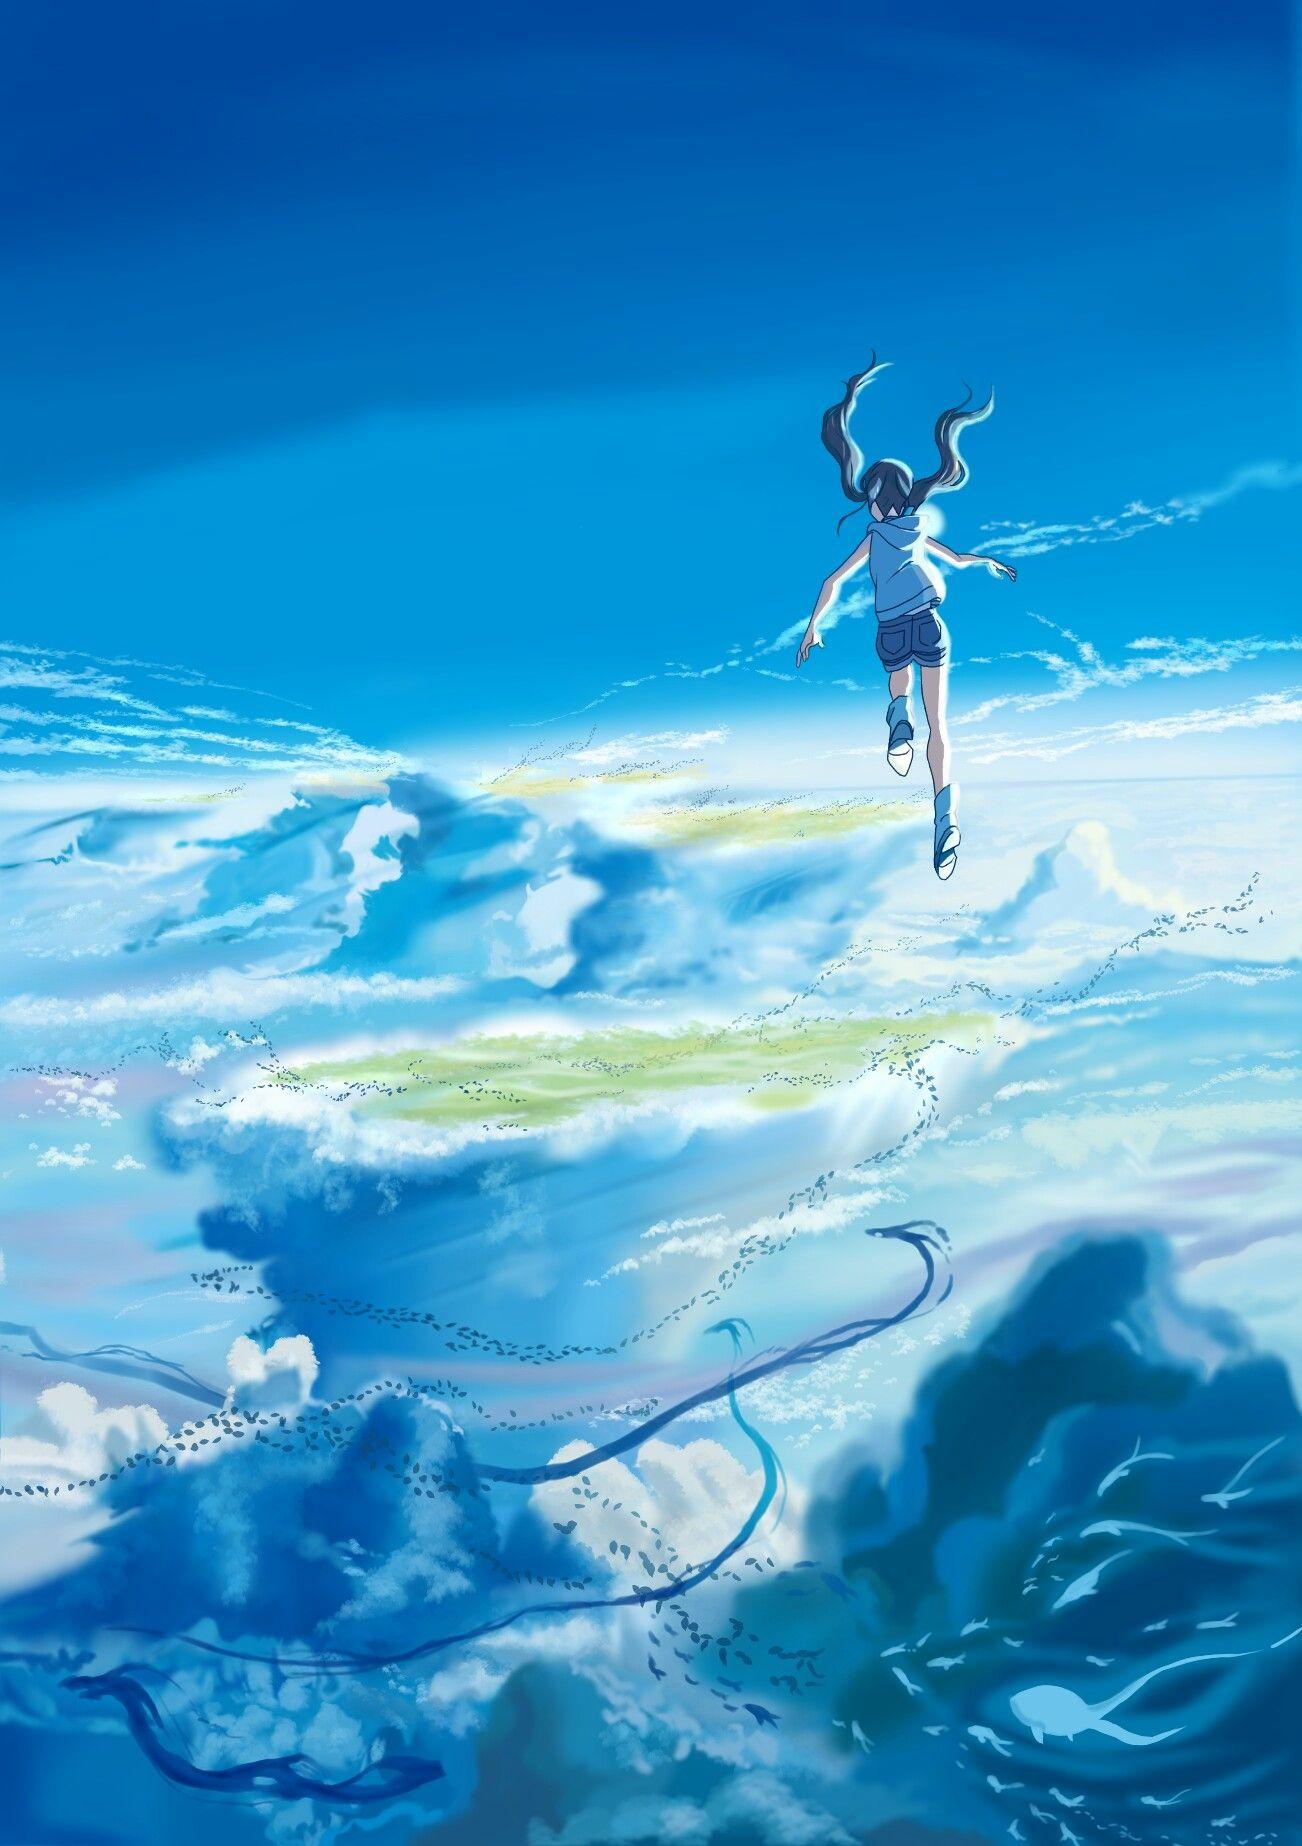 Like Movies おしゃれまとめの人気アイデア Pinterest 佑 斗 夏イラスト 幻想的なイラスト アニメの風景